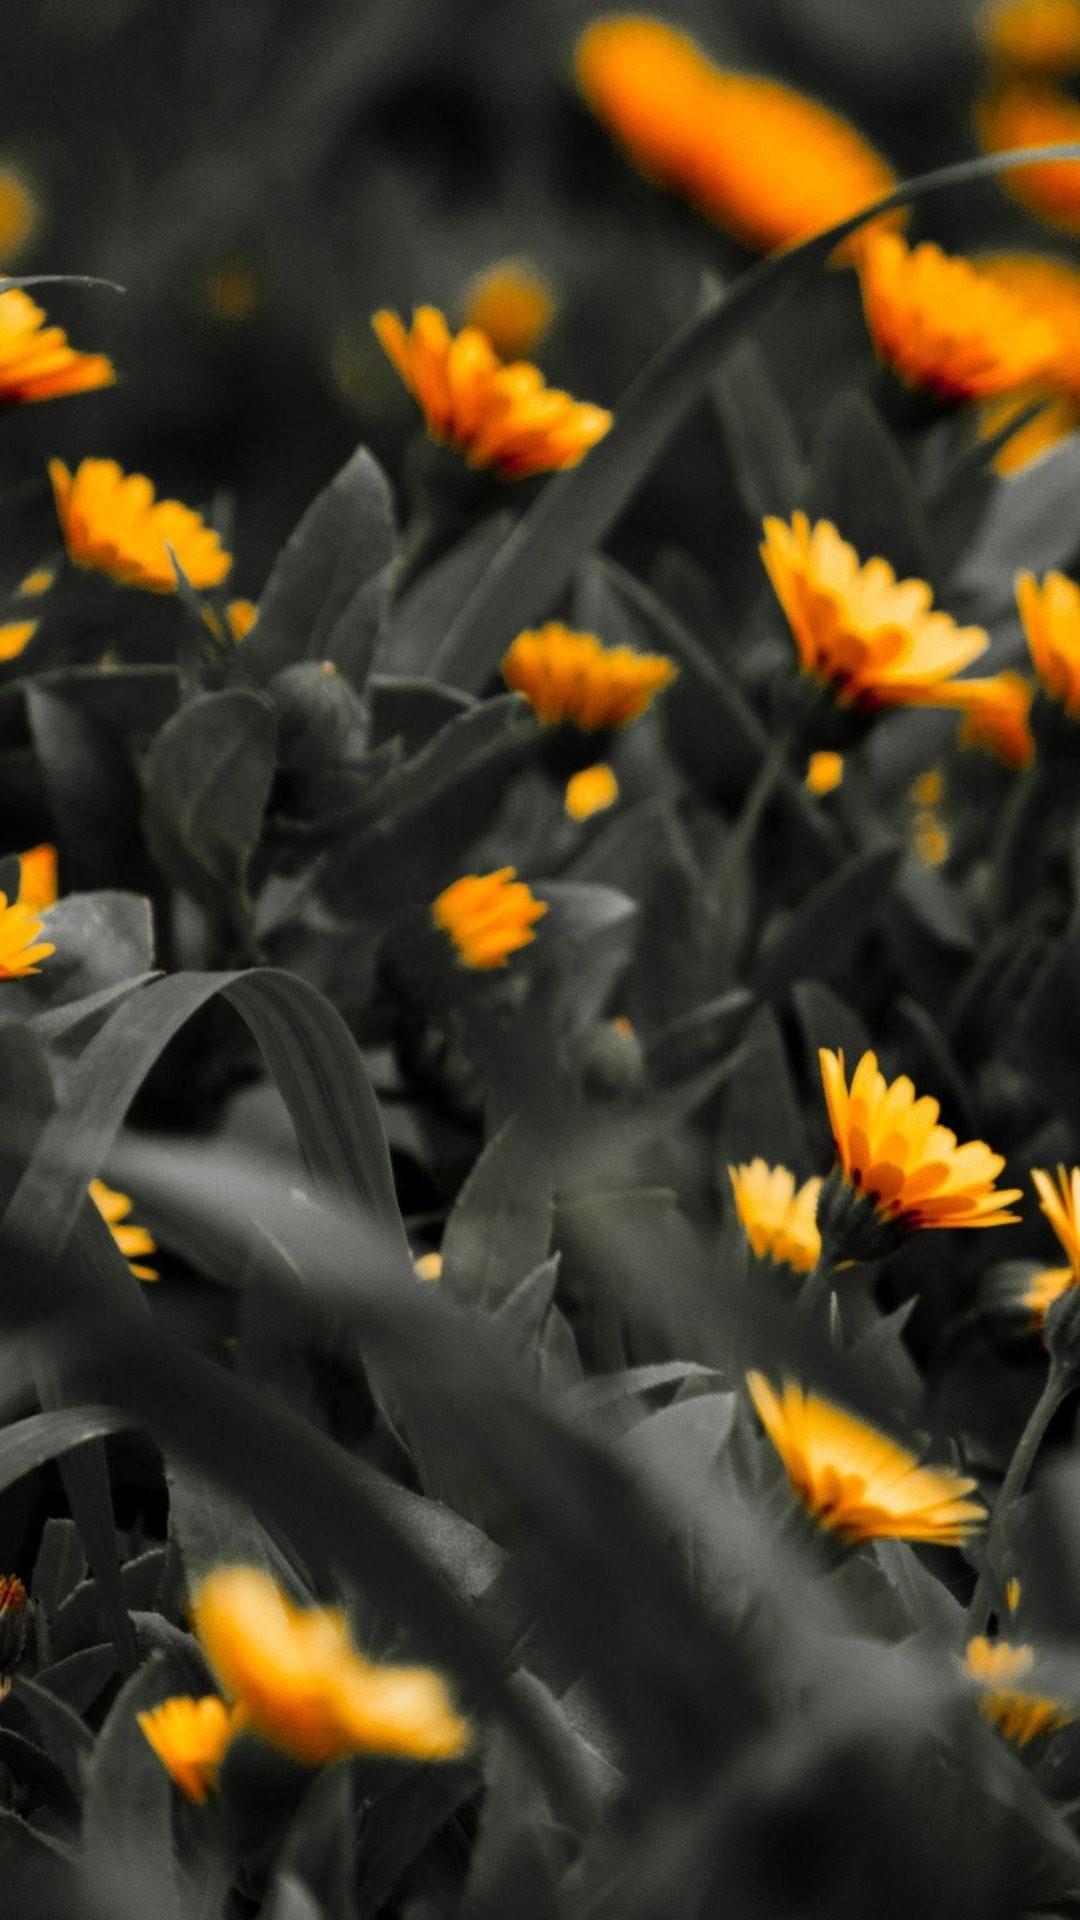 Flowers On Black Background Wallpaper 77 Images